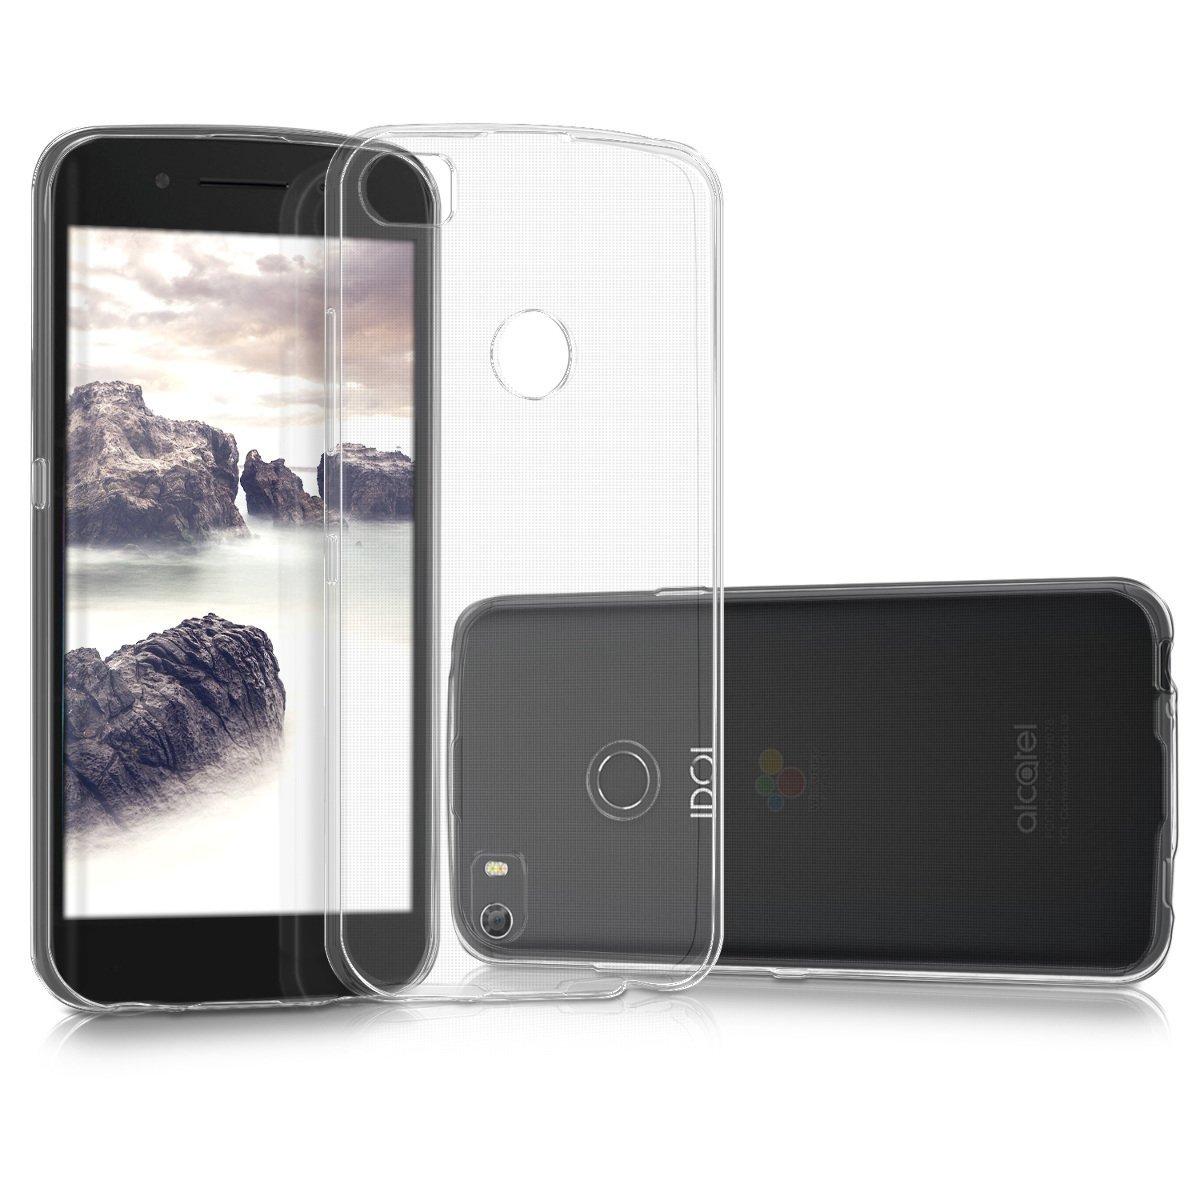 KW Θήκη Σιλικόνης Alcatel Idol 5s - Clear (43175.03) θήκες κινητών